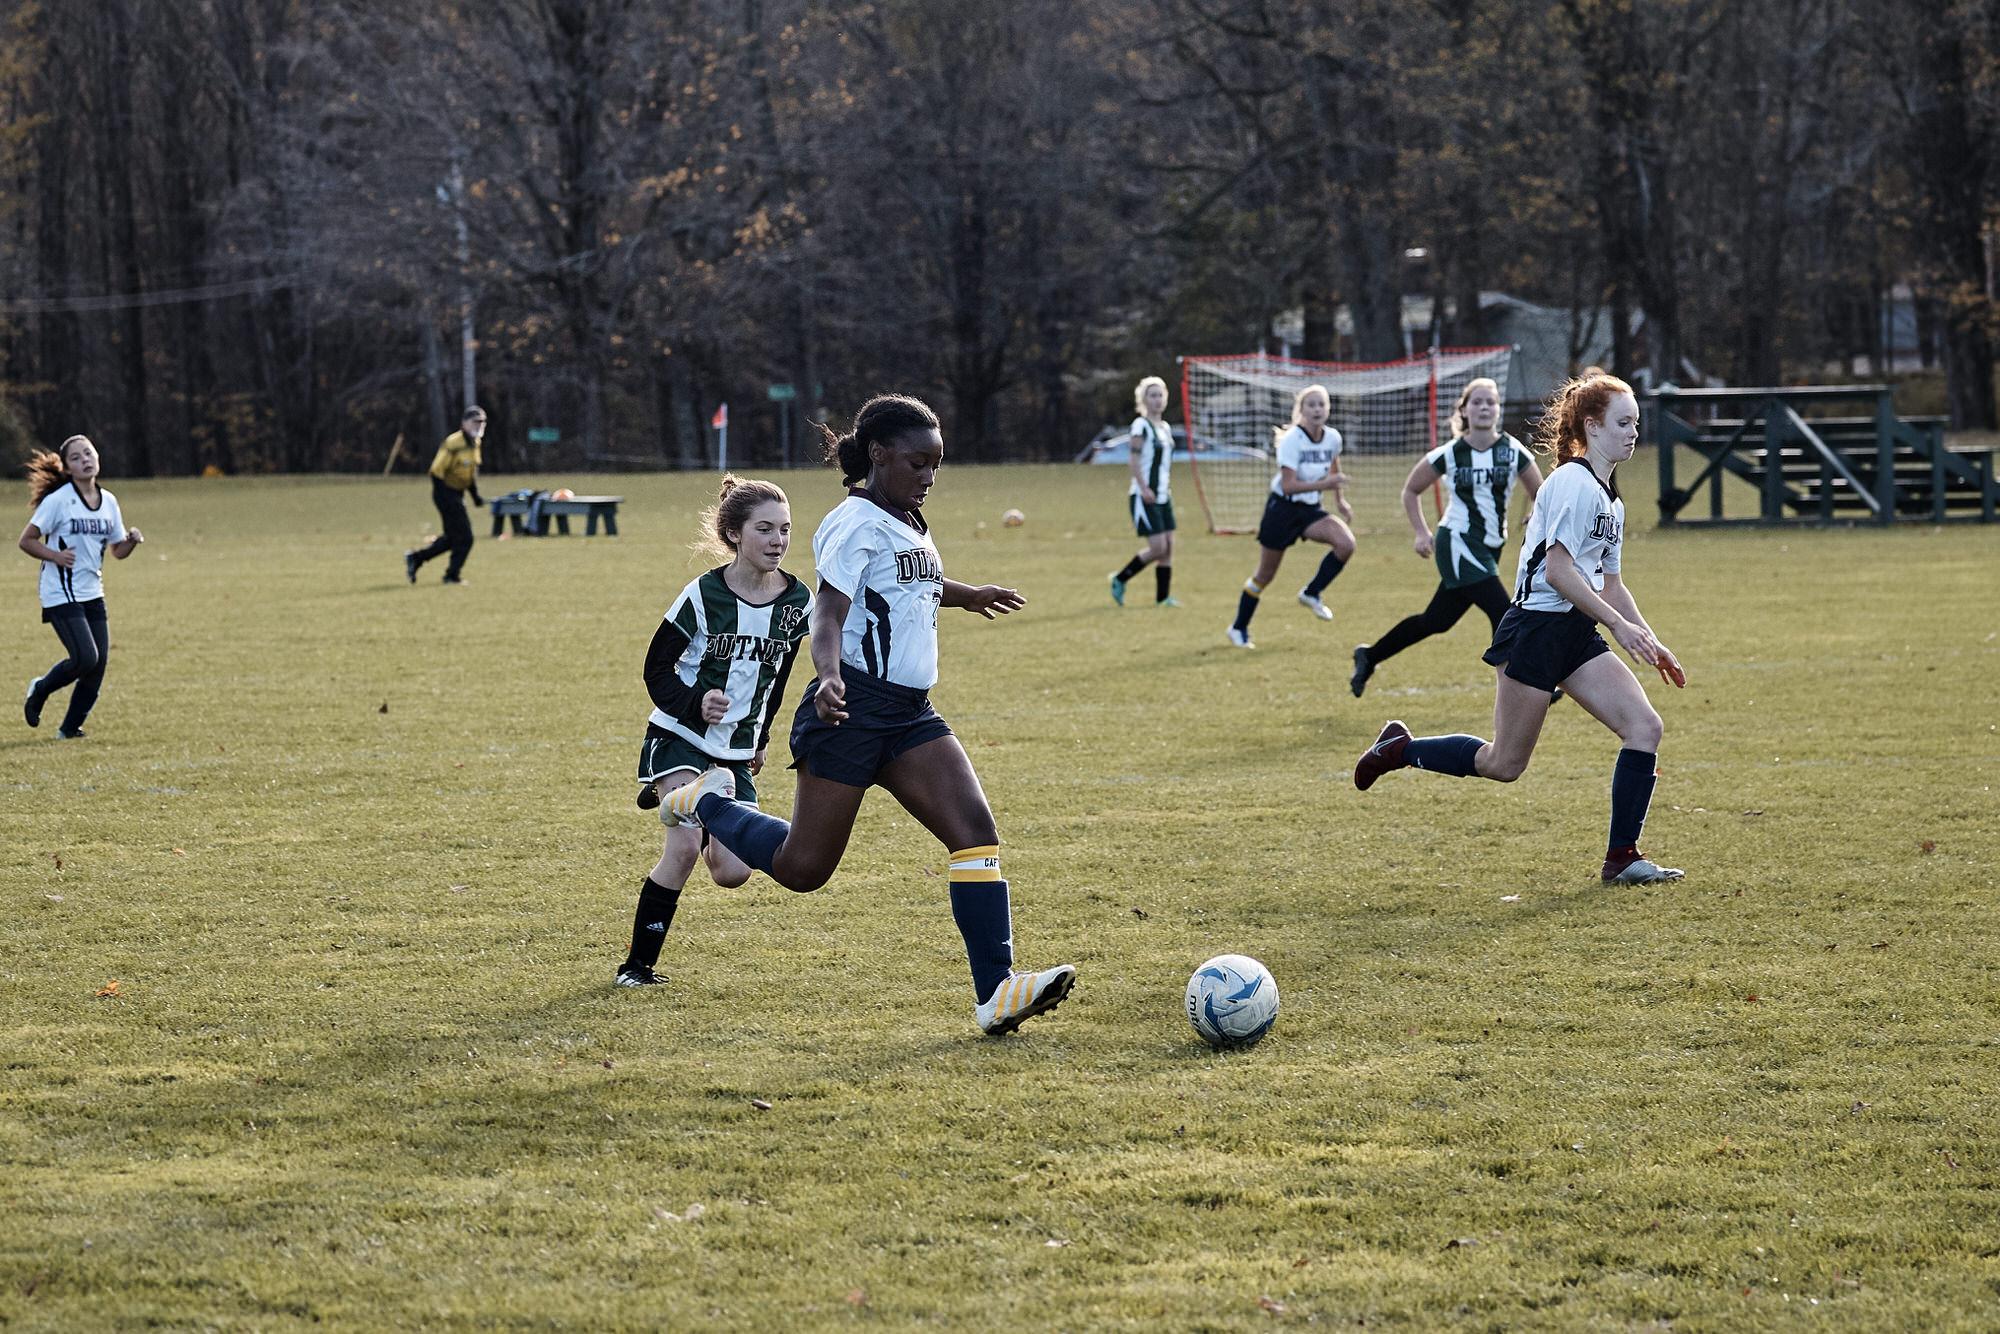 Girls Varsity Soccer vs. Putney School - October 26, 2018 - 038.jpg